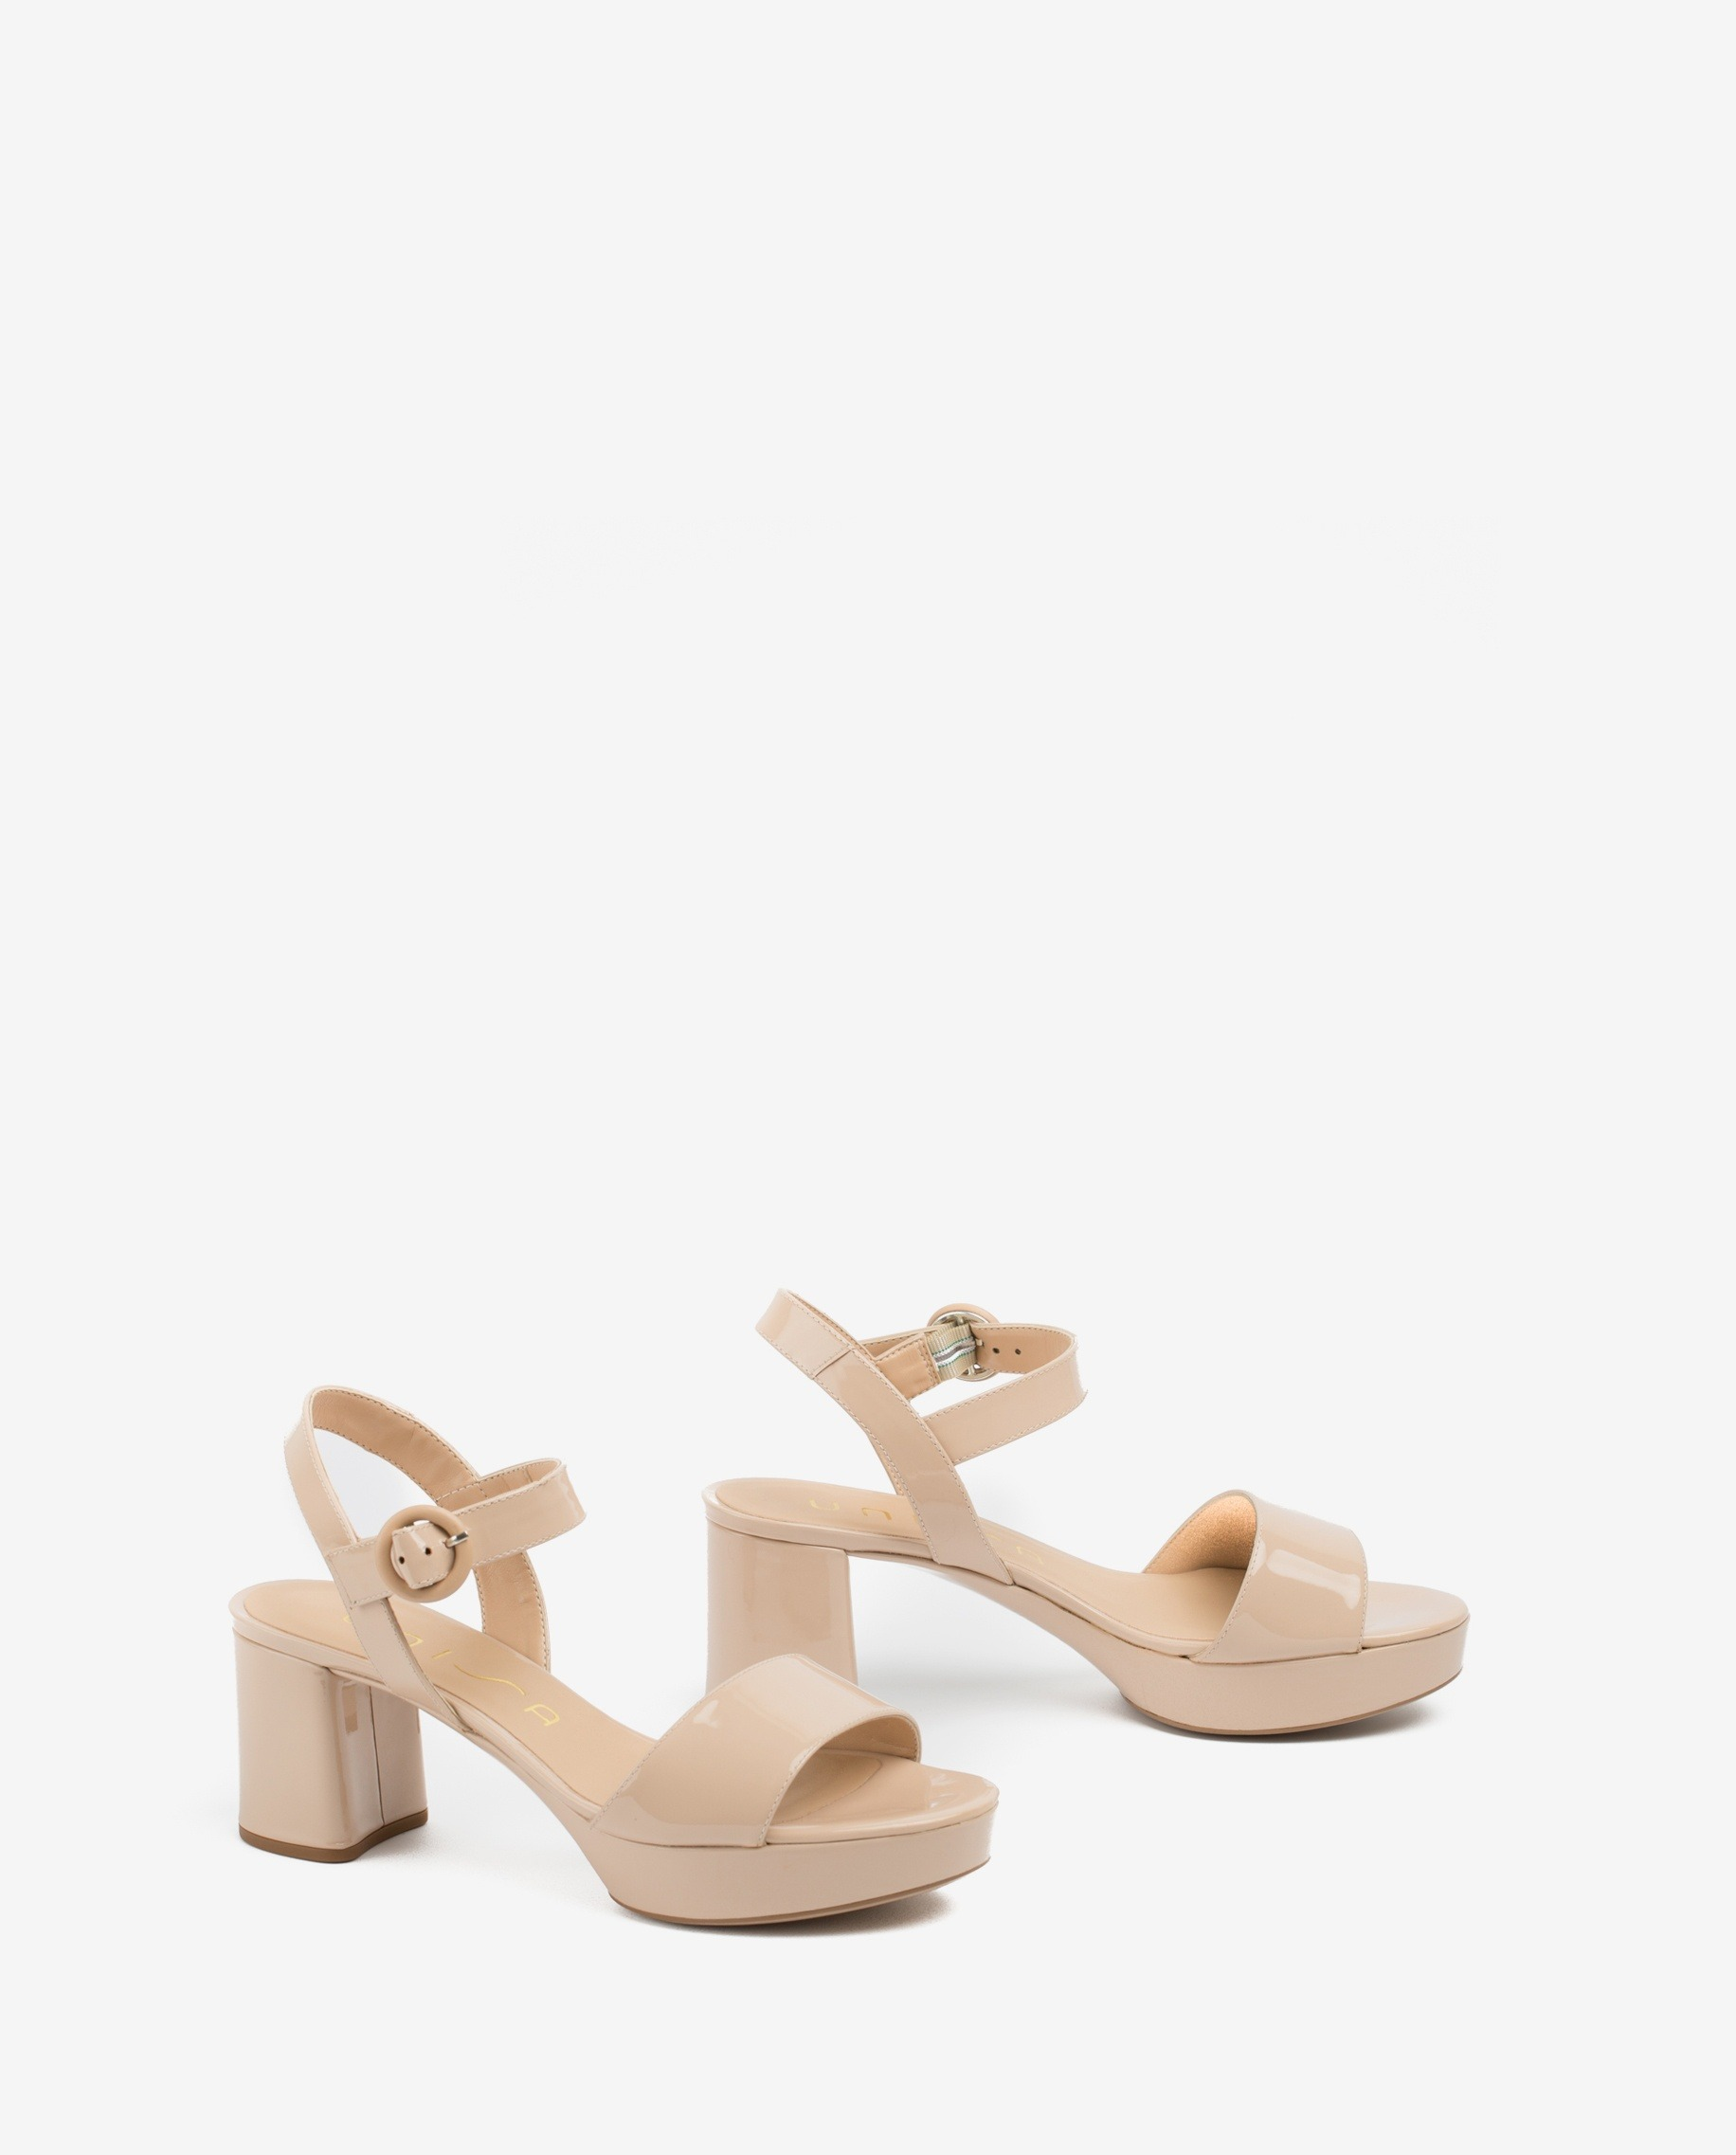 UNISA Platform patent sandals NENES_20_PA nude 2